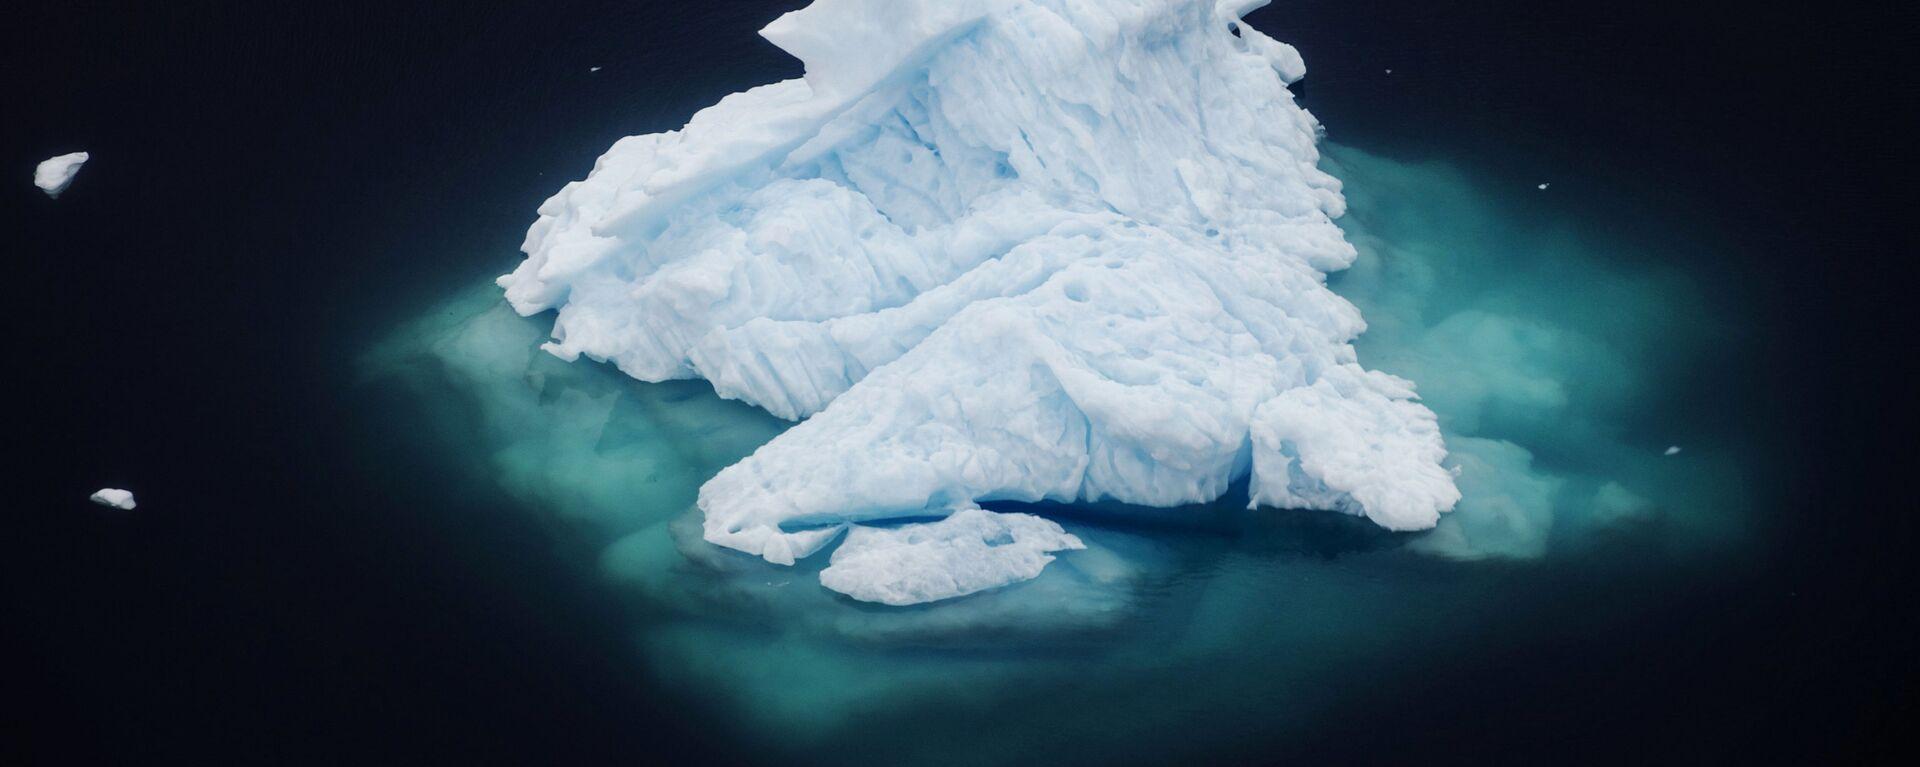 Un iceberg in Groenlandia - Sputnik Italia, 1920, 14.01.2021